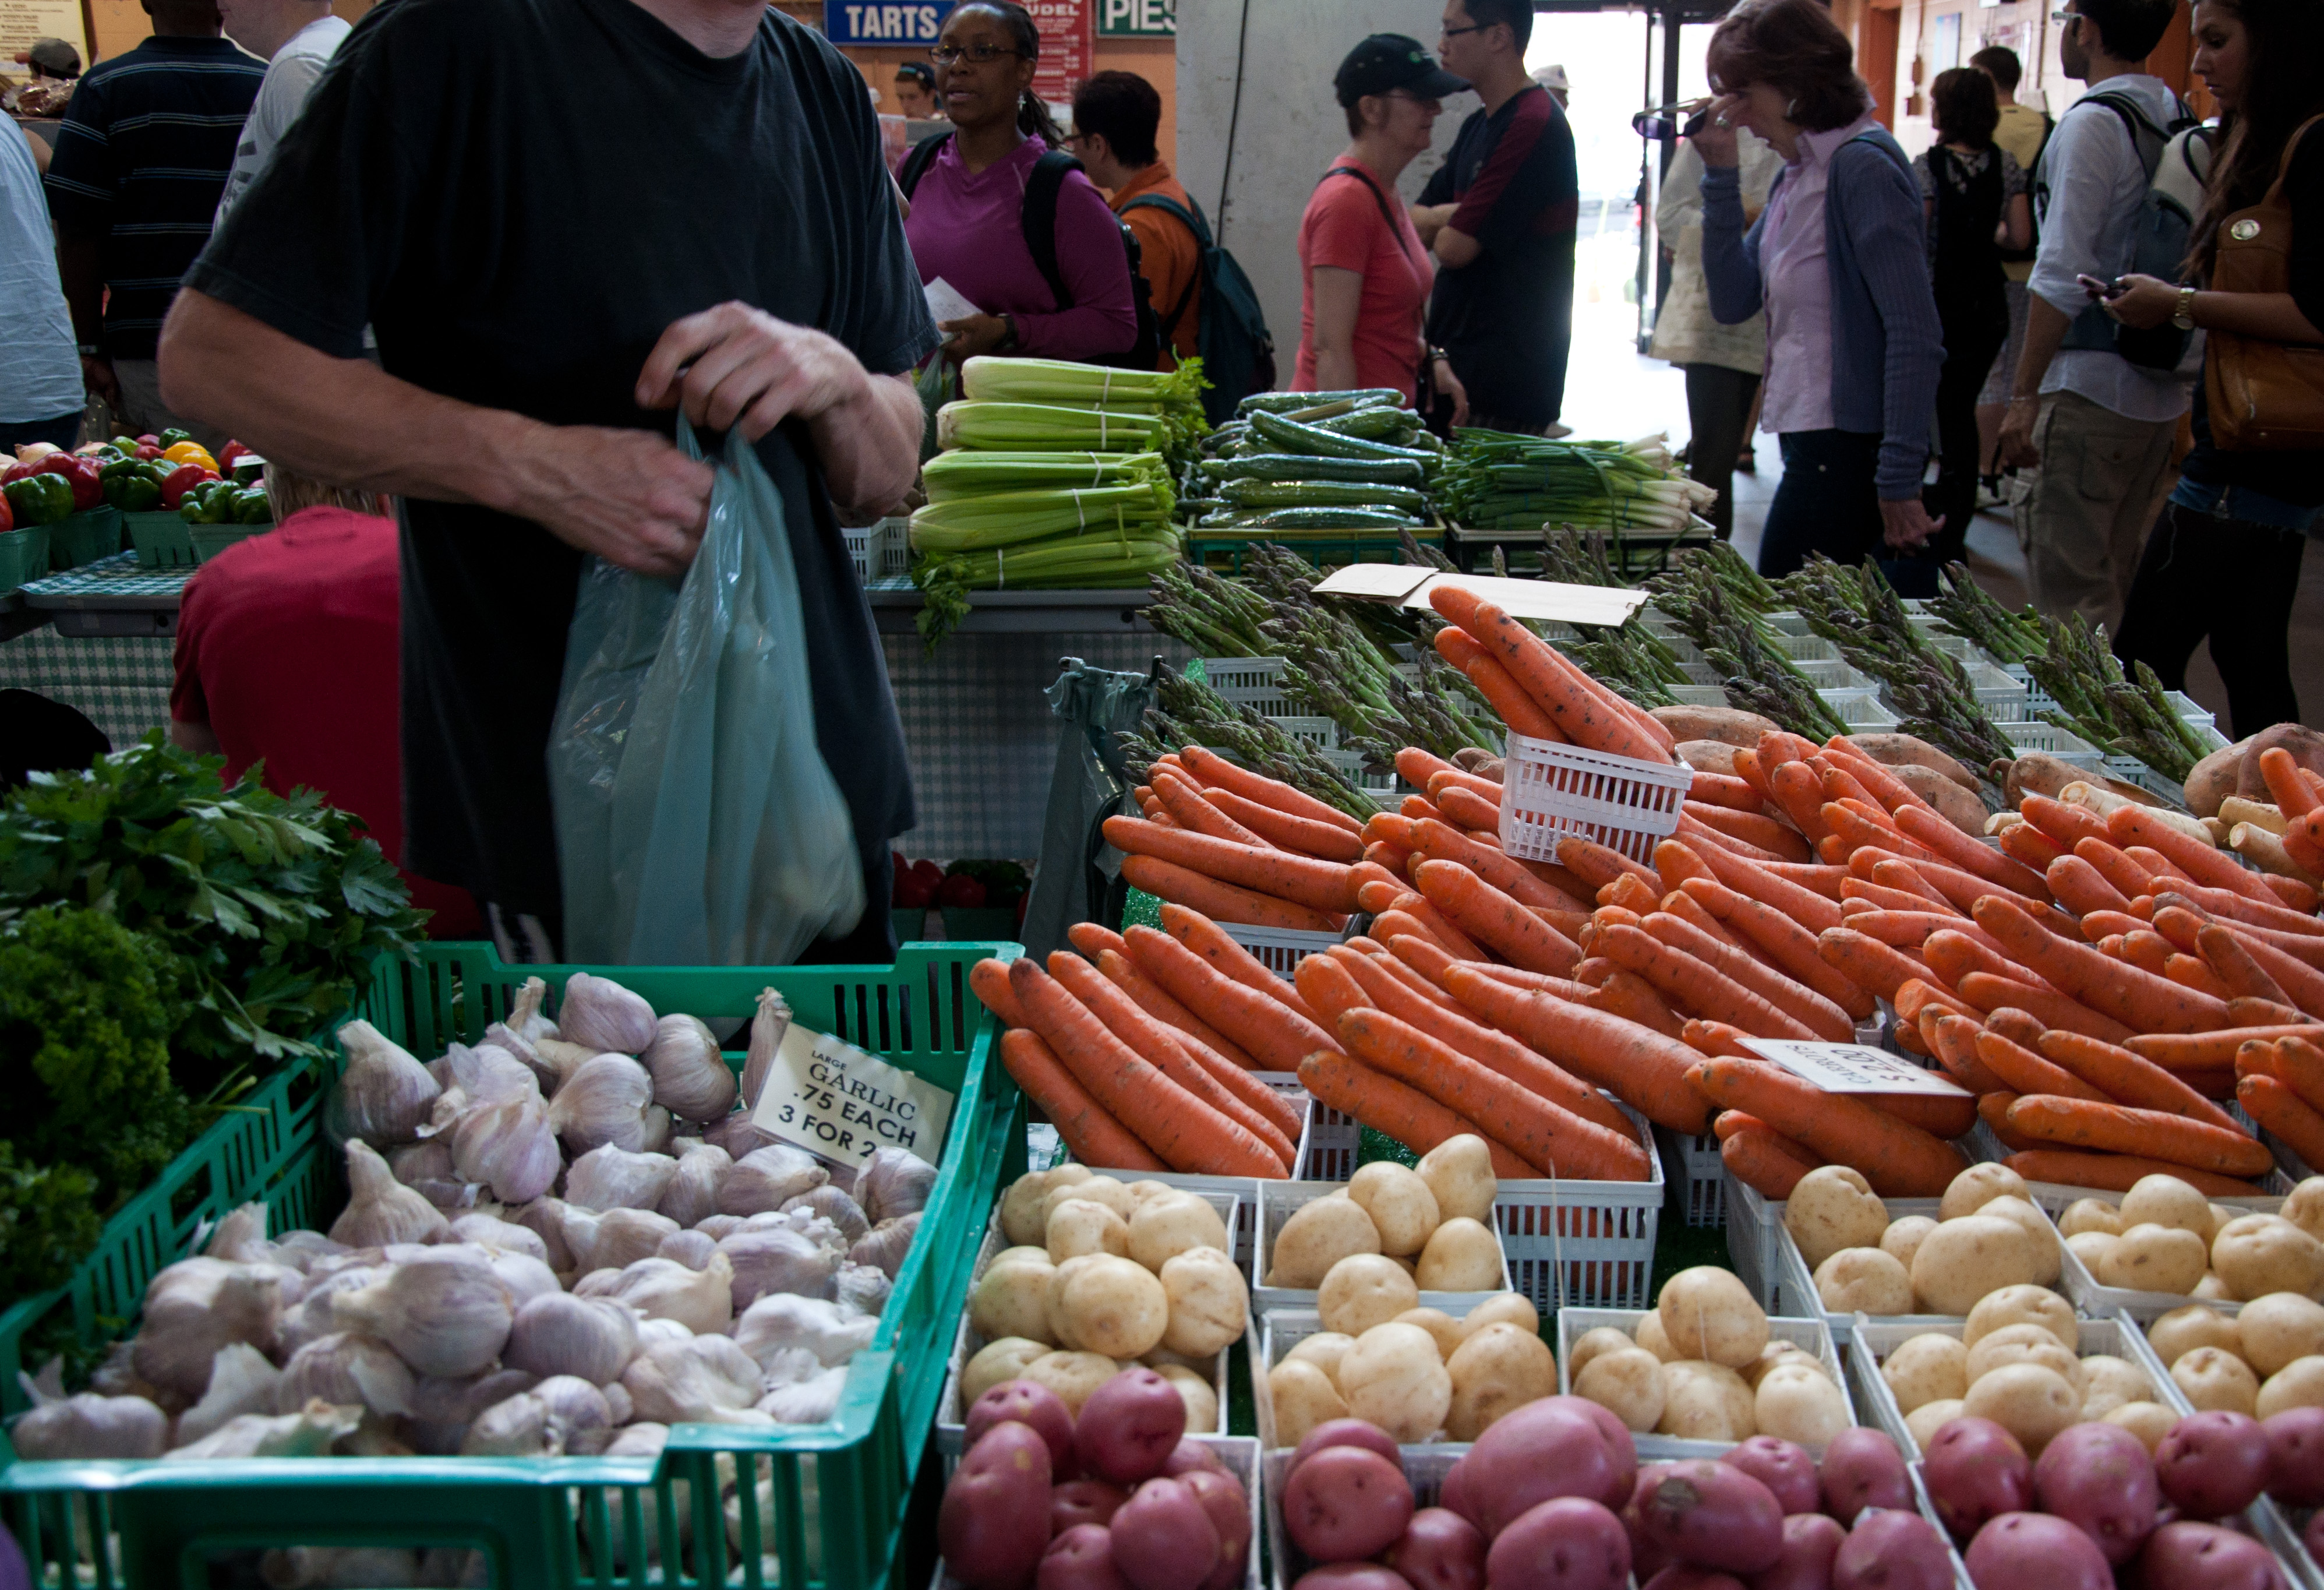 File:St Lawrence Market Toronto 2010 jpg - Wikimedia Commons